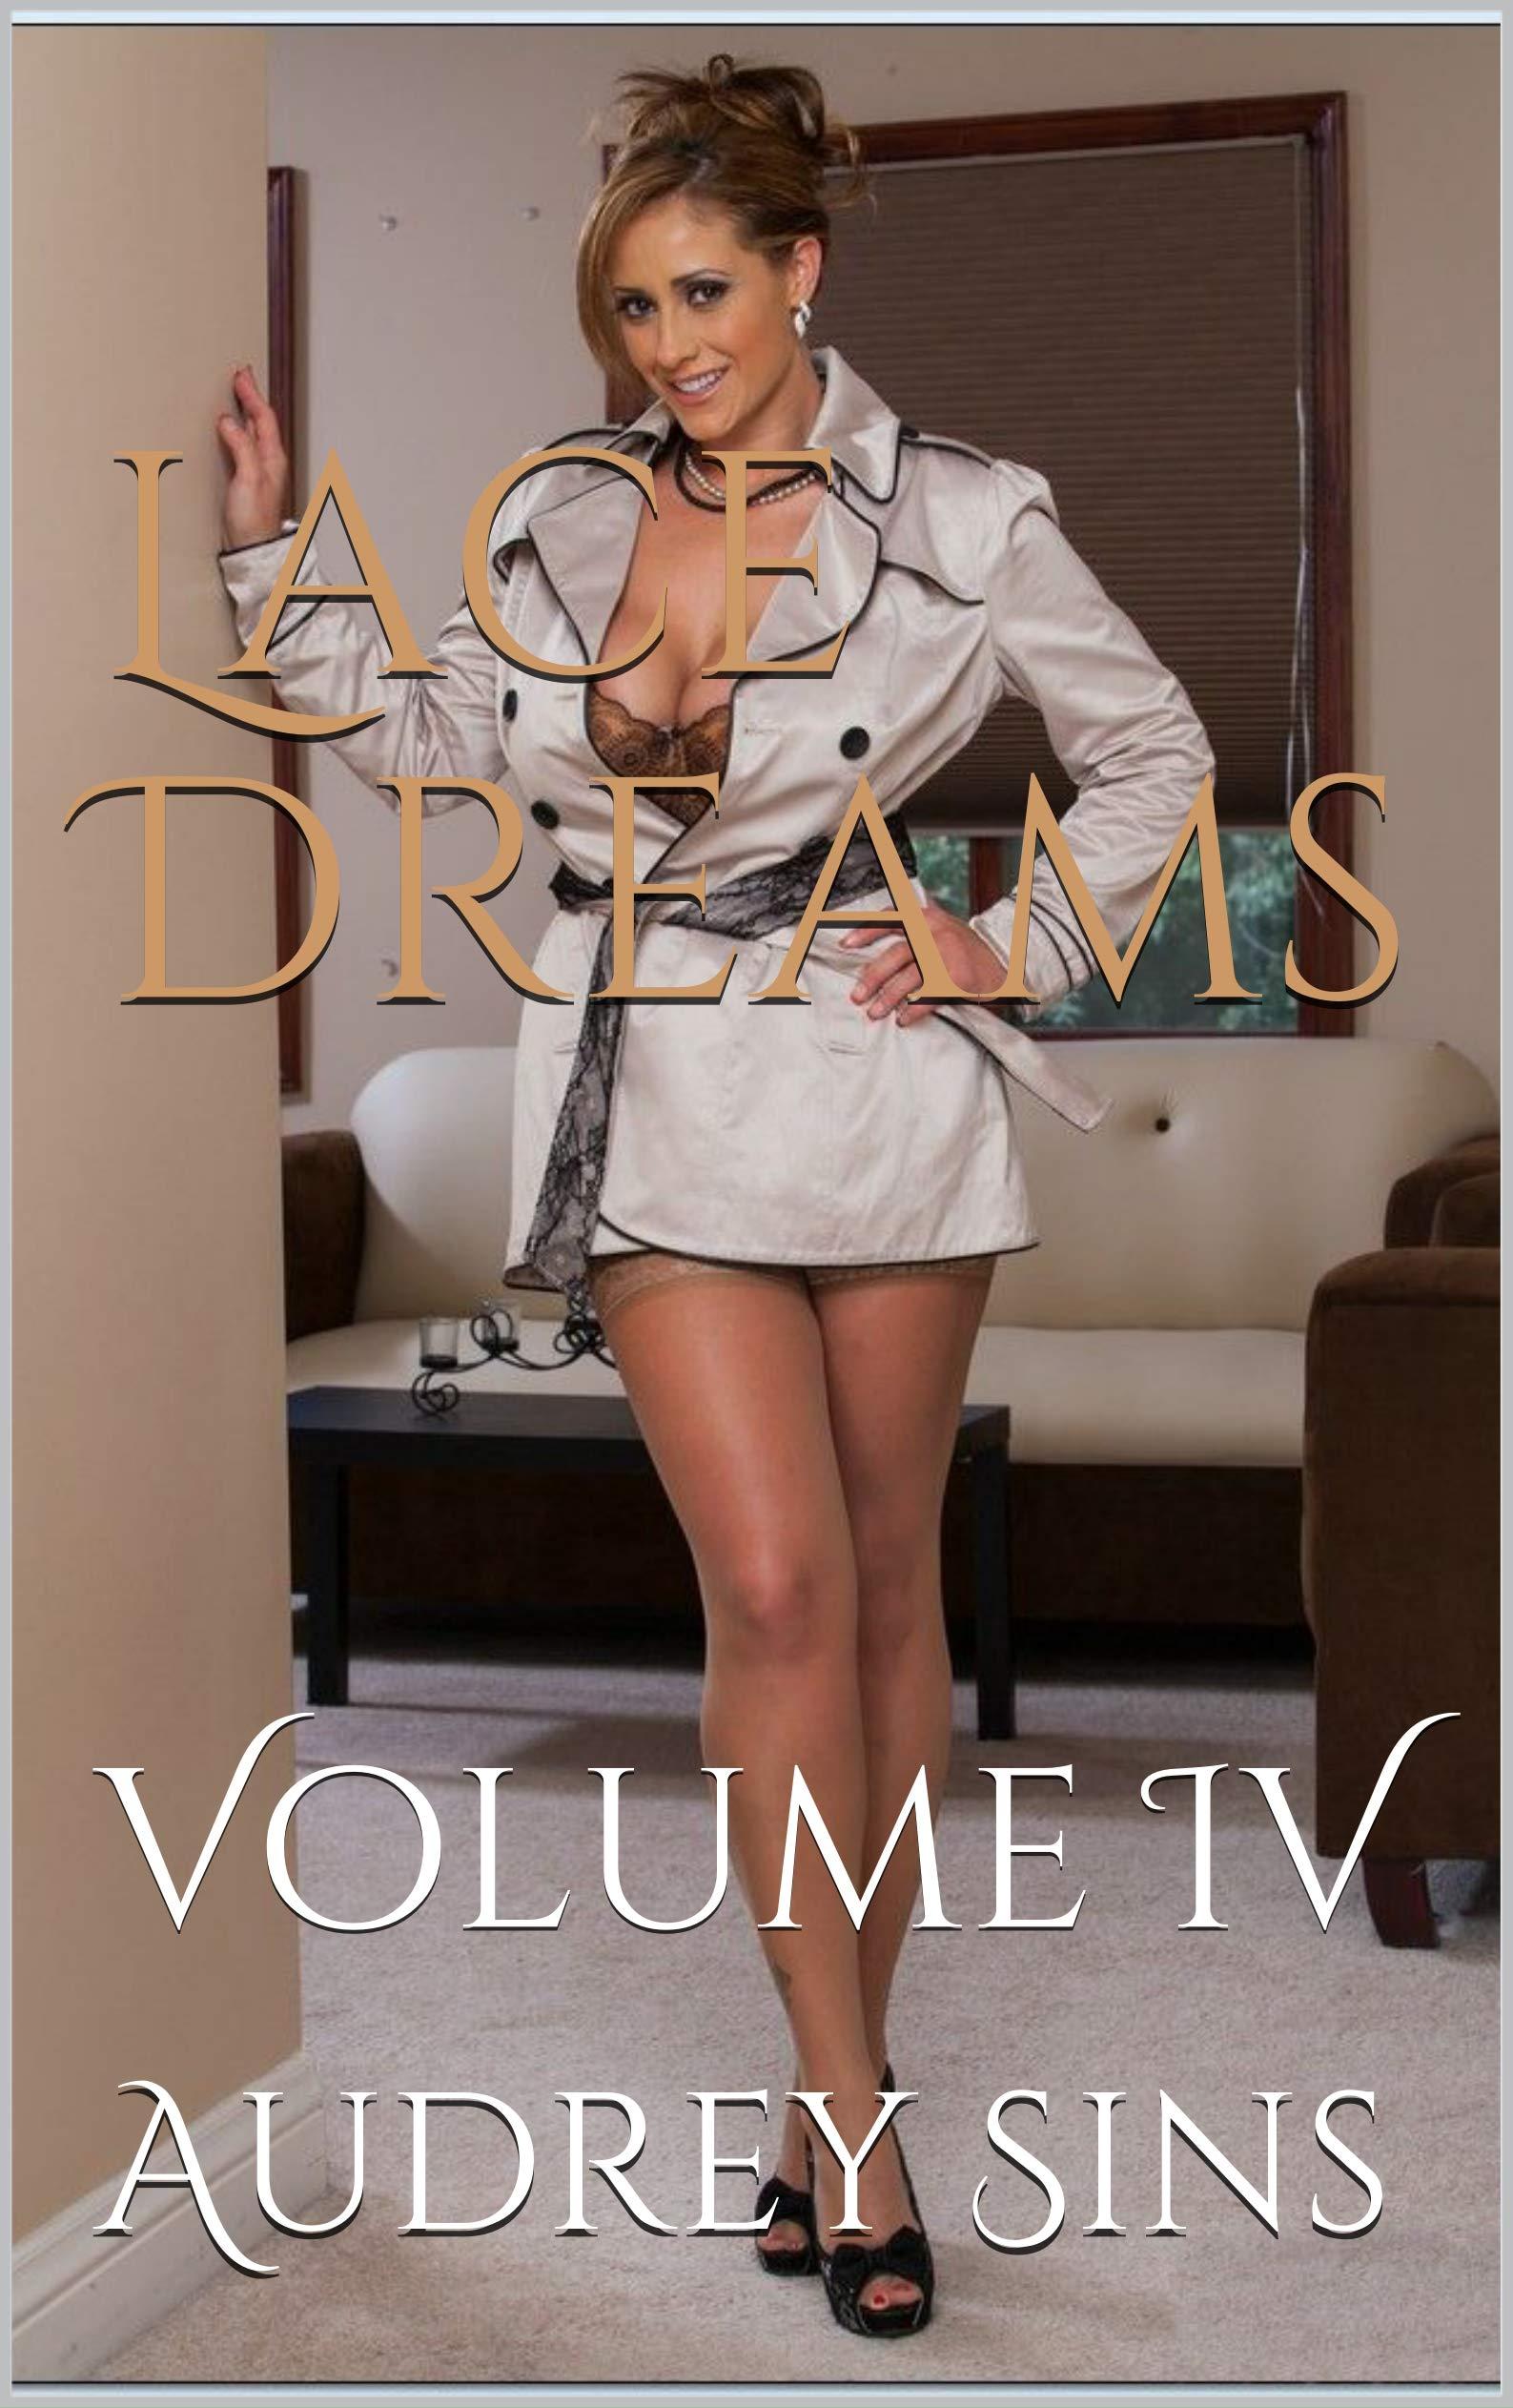 Lace Dreams (erotica, milfs, mature women): Volume IV